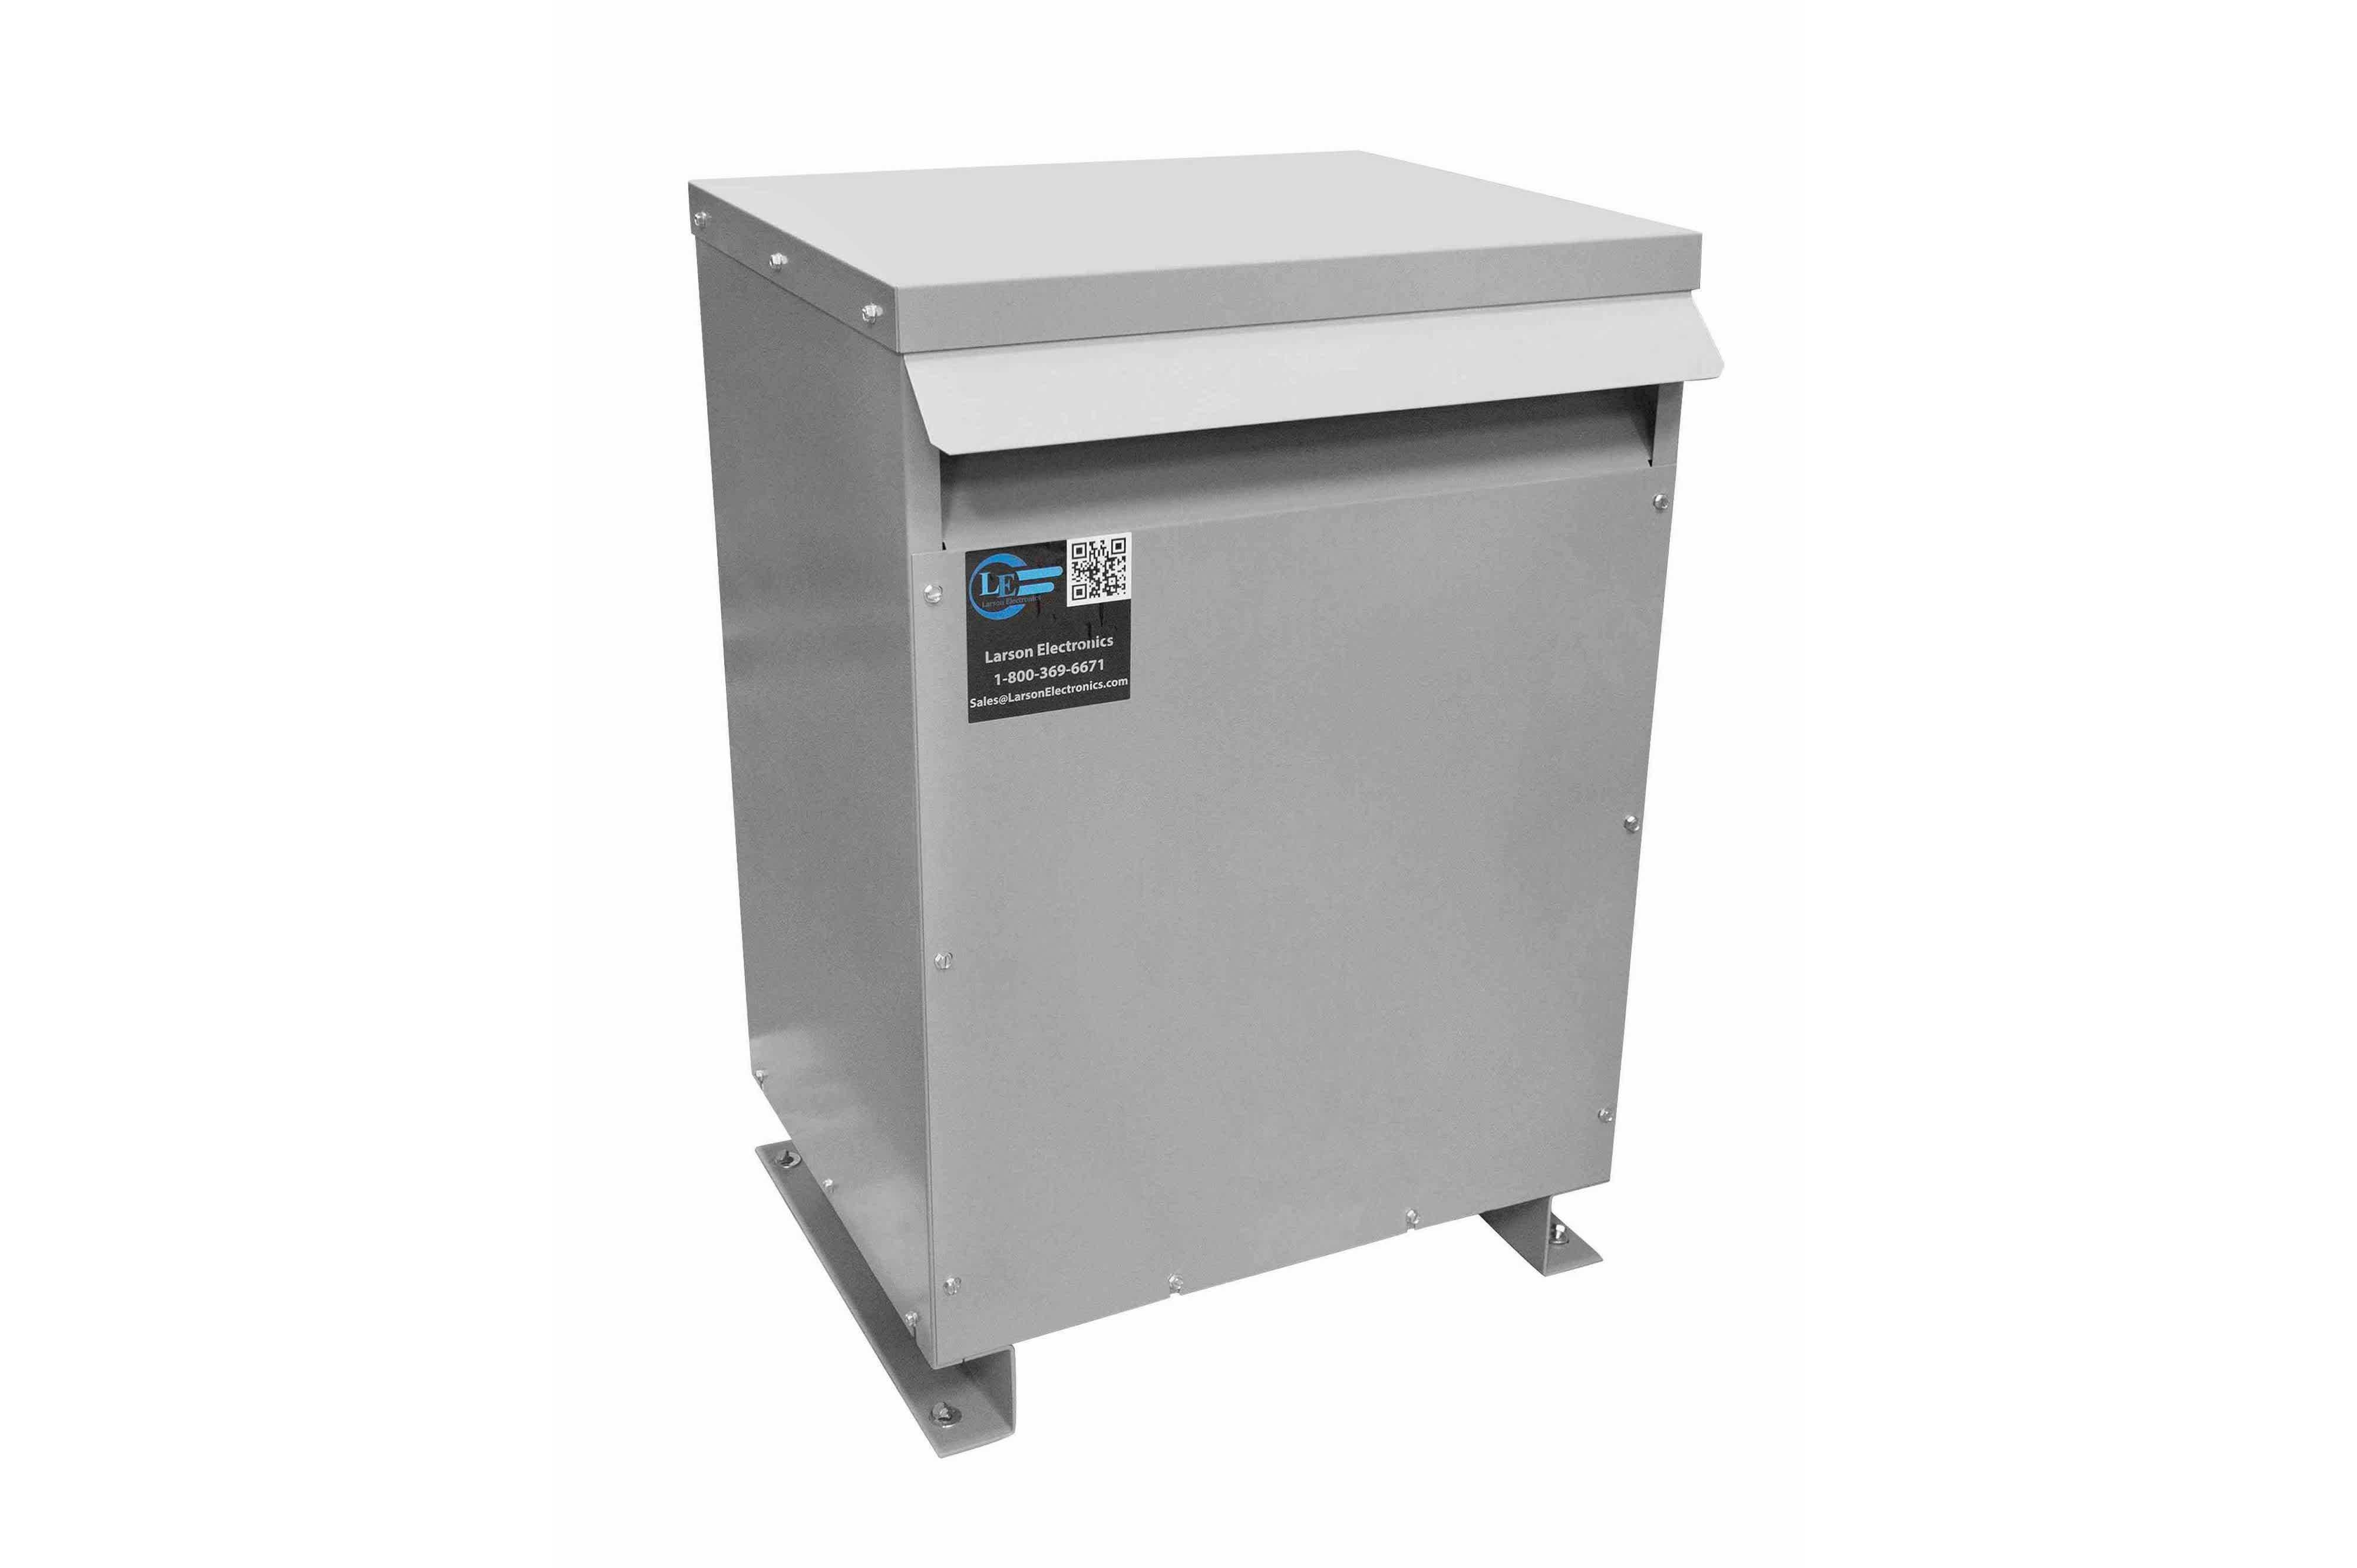 65 kVA 3PH Isolation Transformer, 600V Wye Primary, 415Y/240 Wye-N Secondary, N3R, Ventilated, 60 Hz